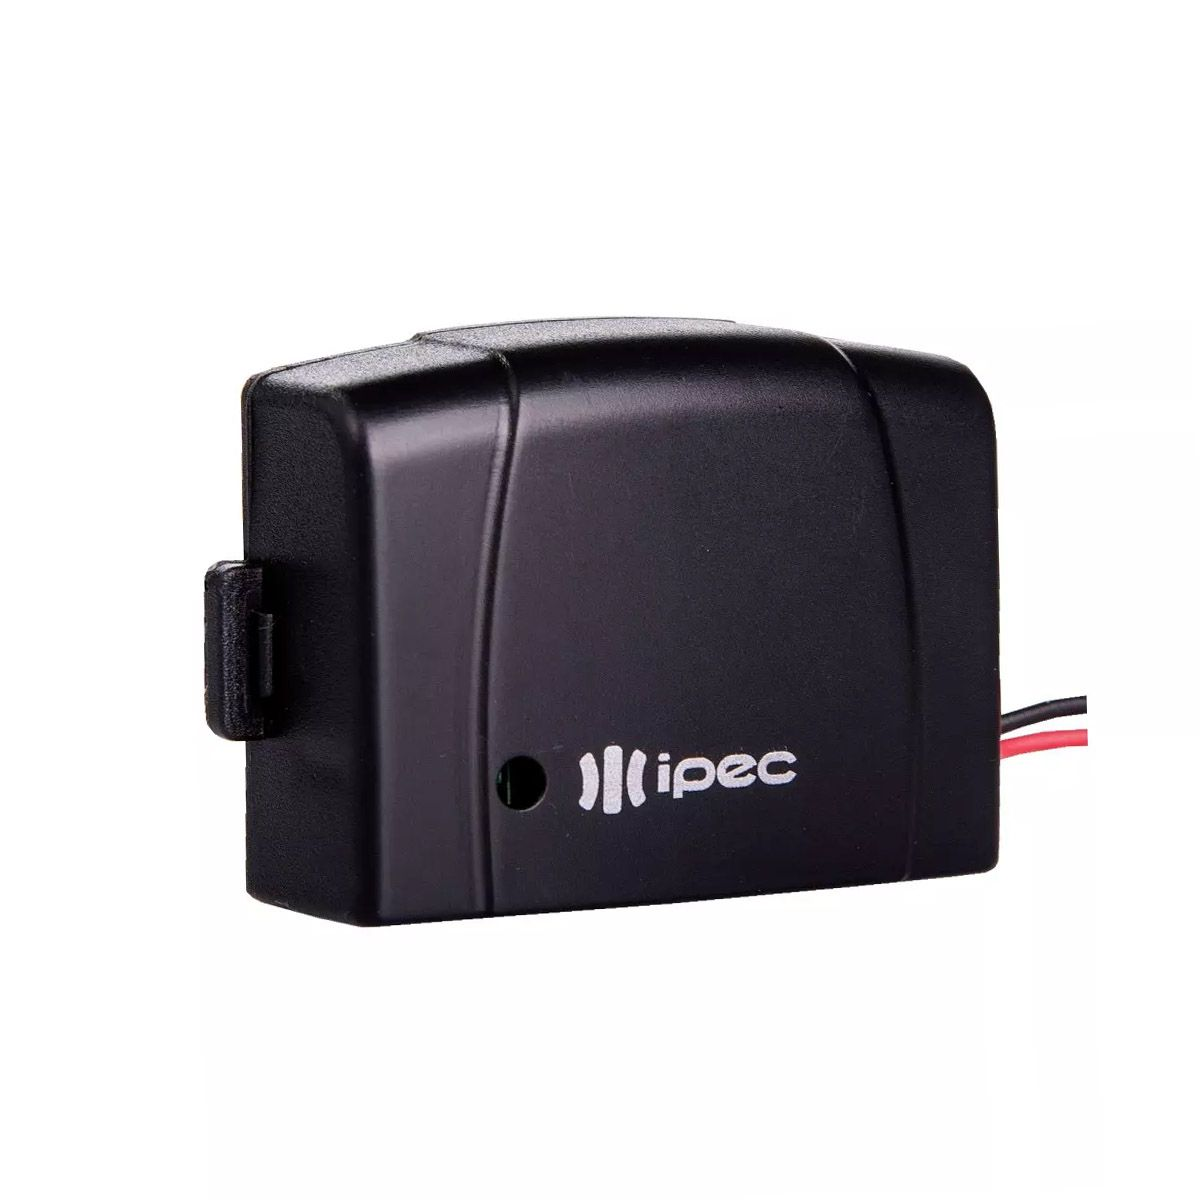 10pcs Controle Veicular Ppa Garen Motor Portao Farol Saw